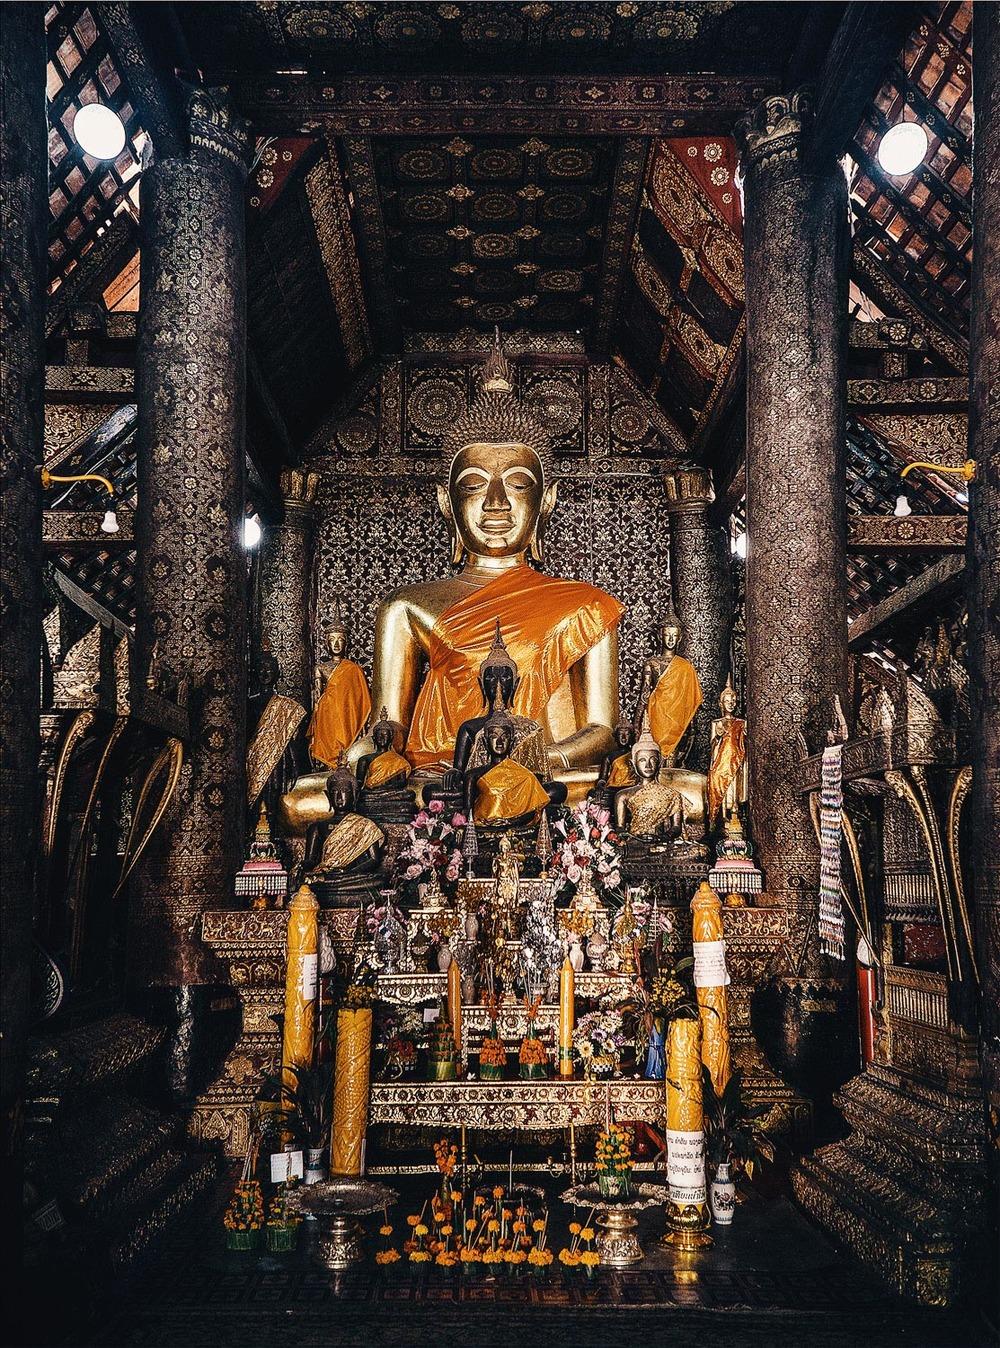 CallieGiovanna_SoutheastAsia_Laos_LuangPrabang_20121231_3821.jpg